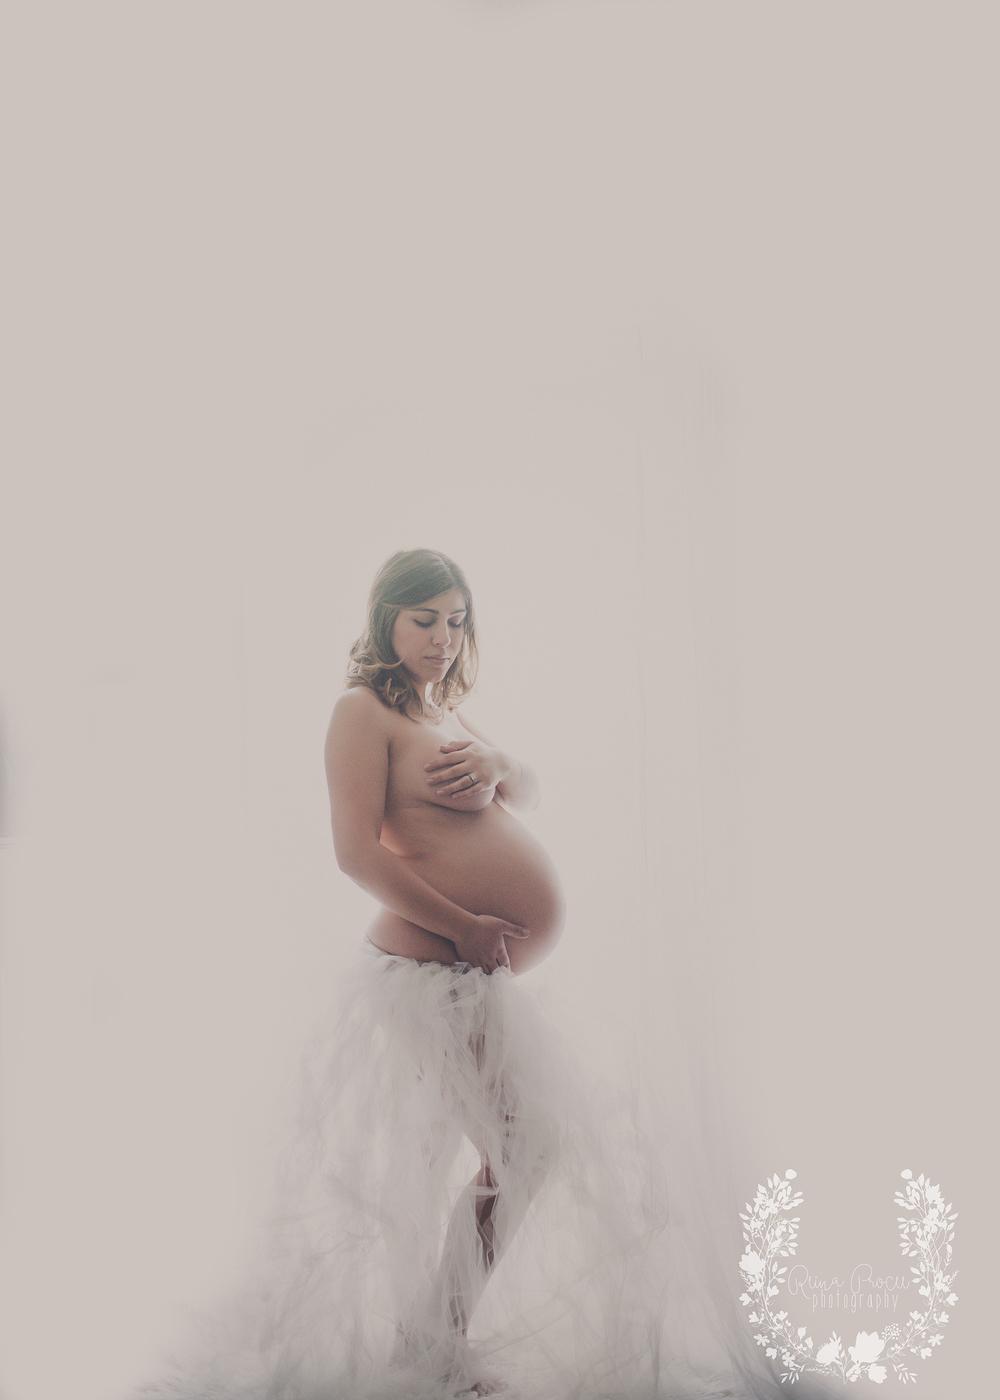 maternity-newborn-montreal-photos-fine-art-photographer-15.png